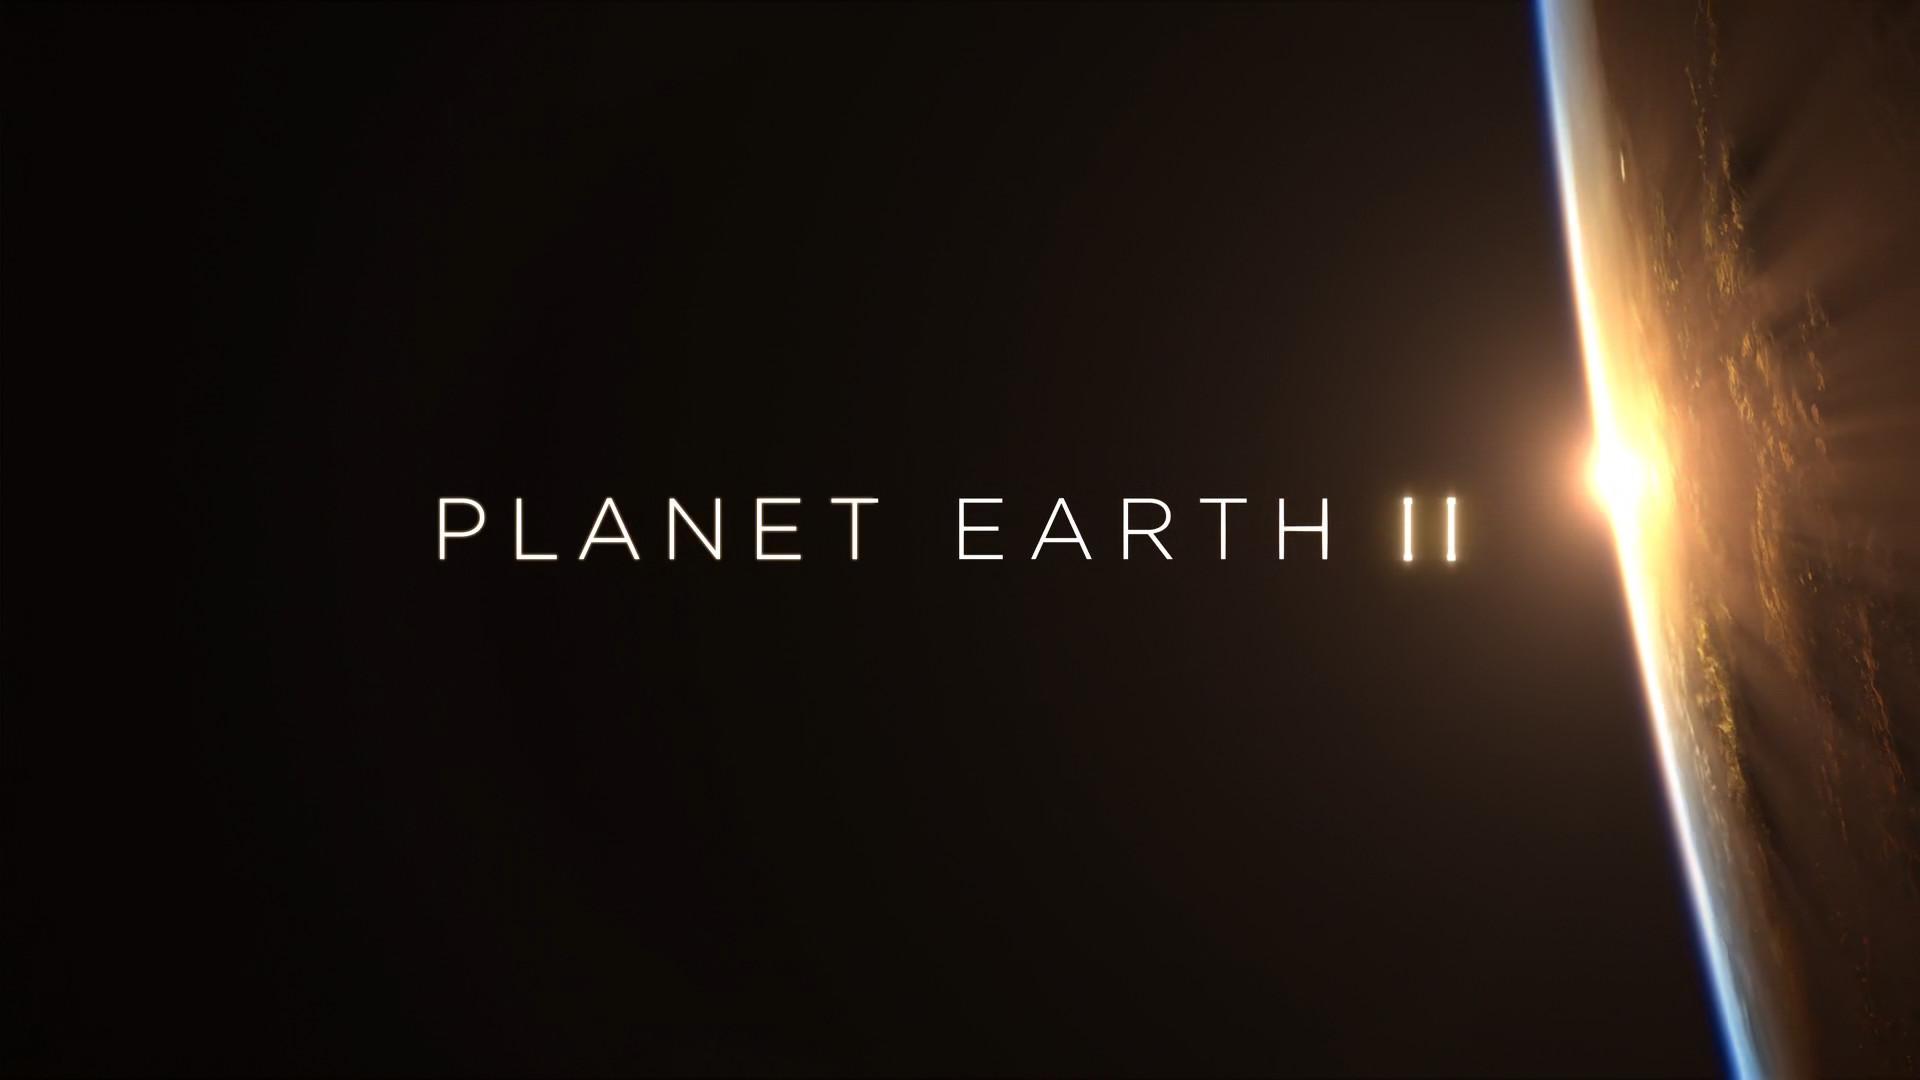 Planet Earth II Screenshots/Wallpapers